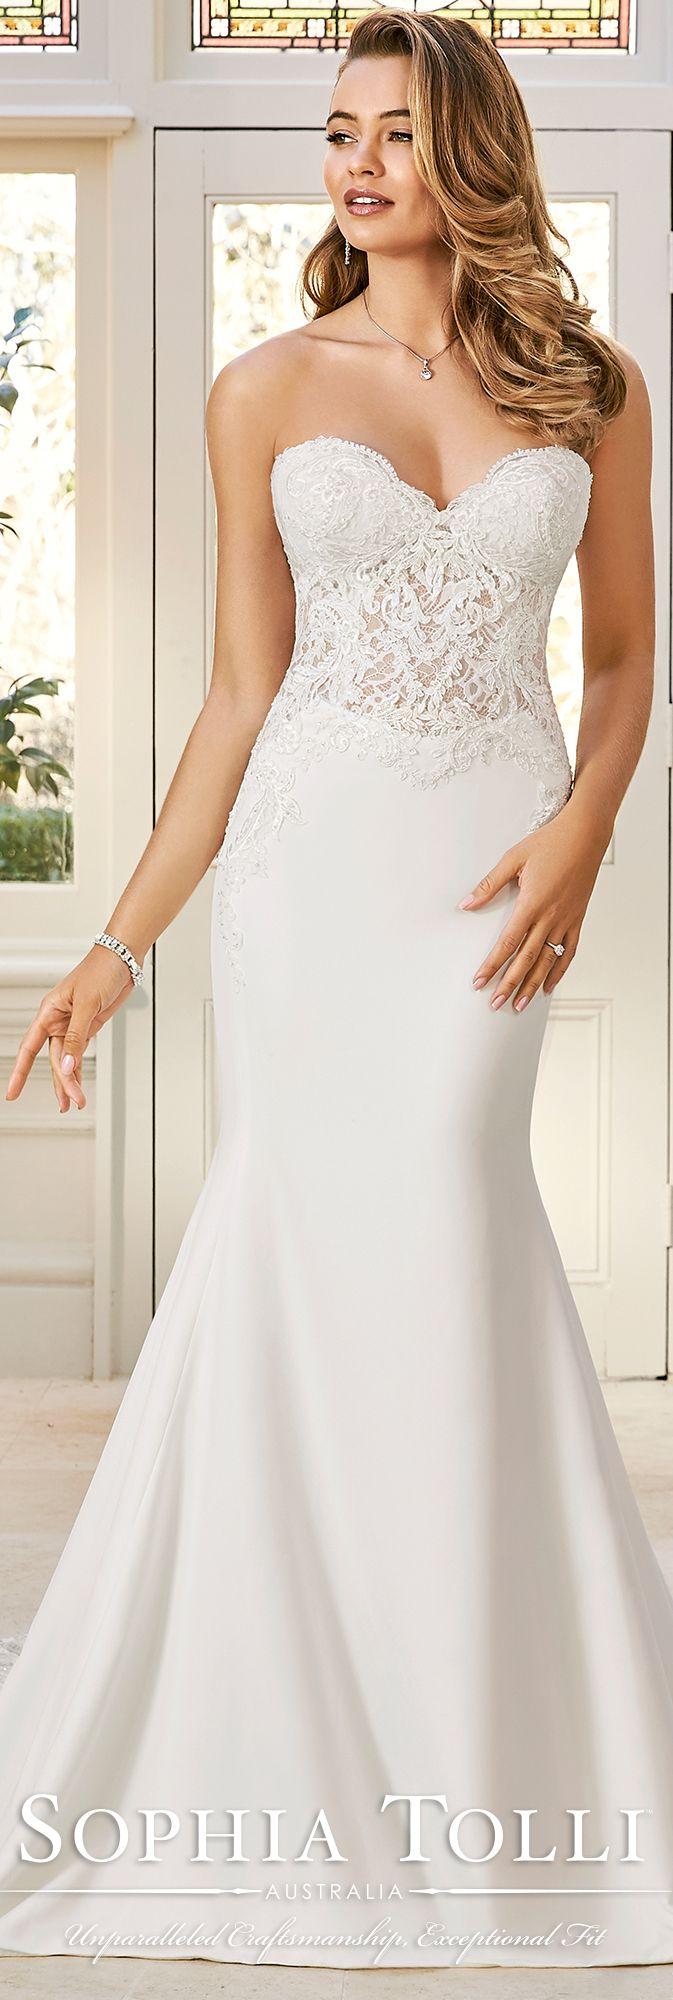 458ecc2fbf49 Stretch Crepe   Allover Lace Fit   Flare WEdding Dress- Y11943 ...